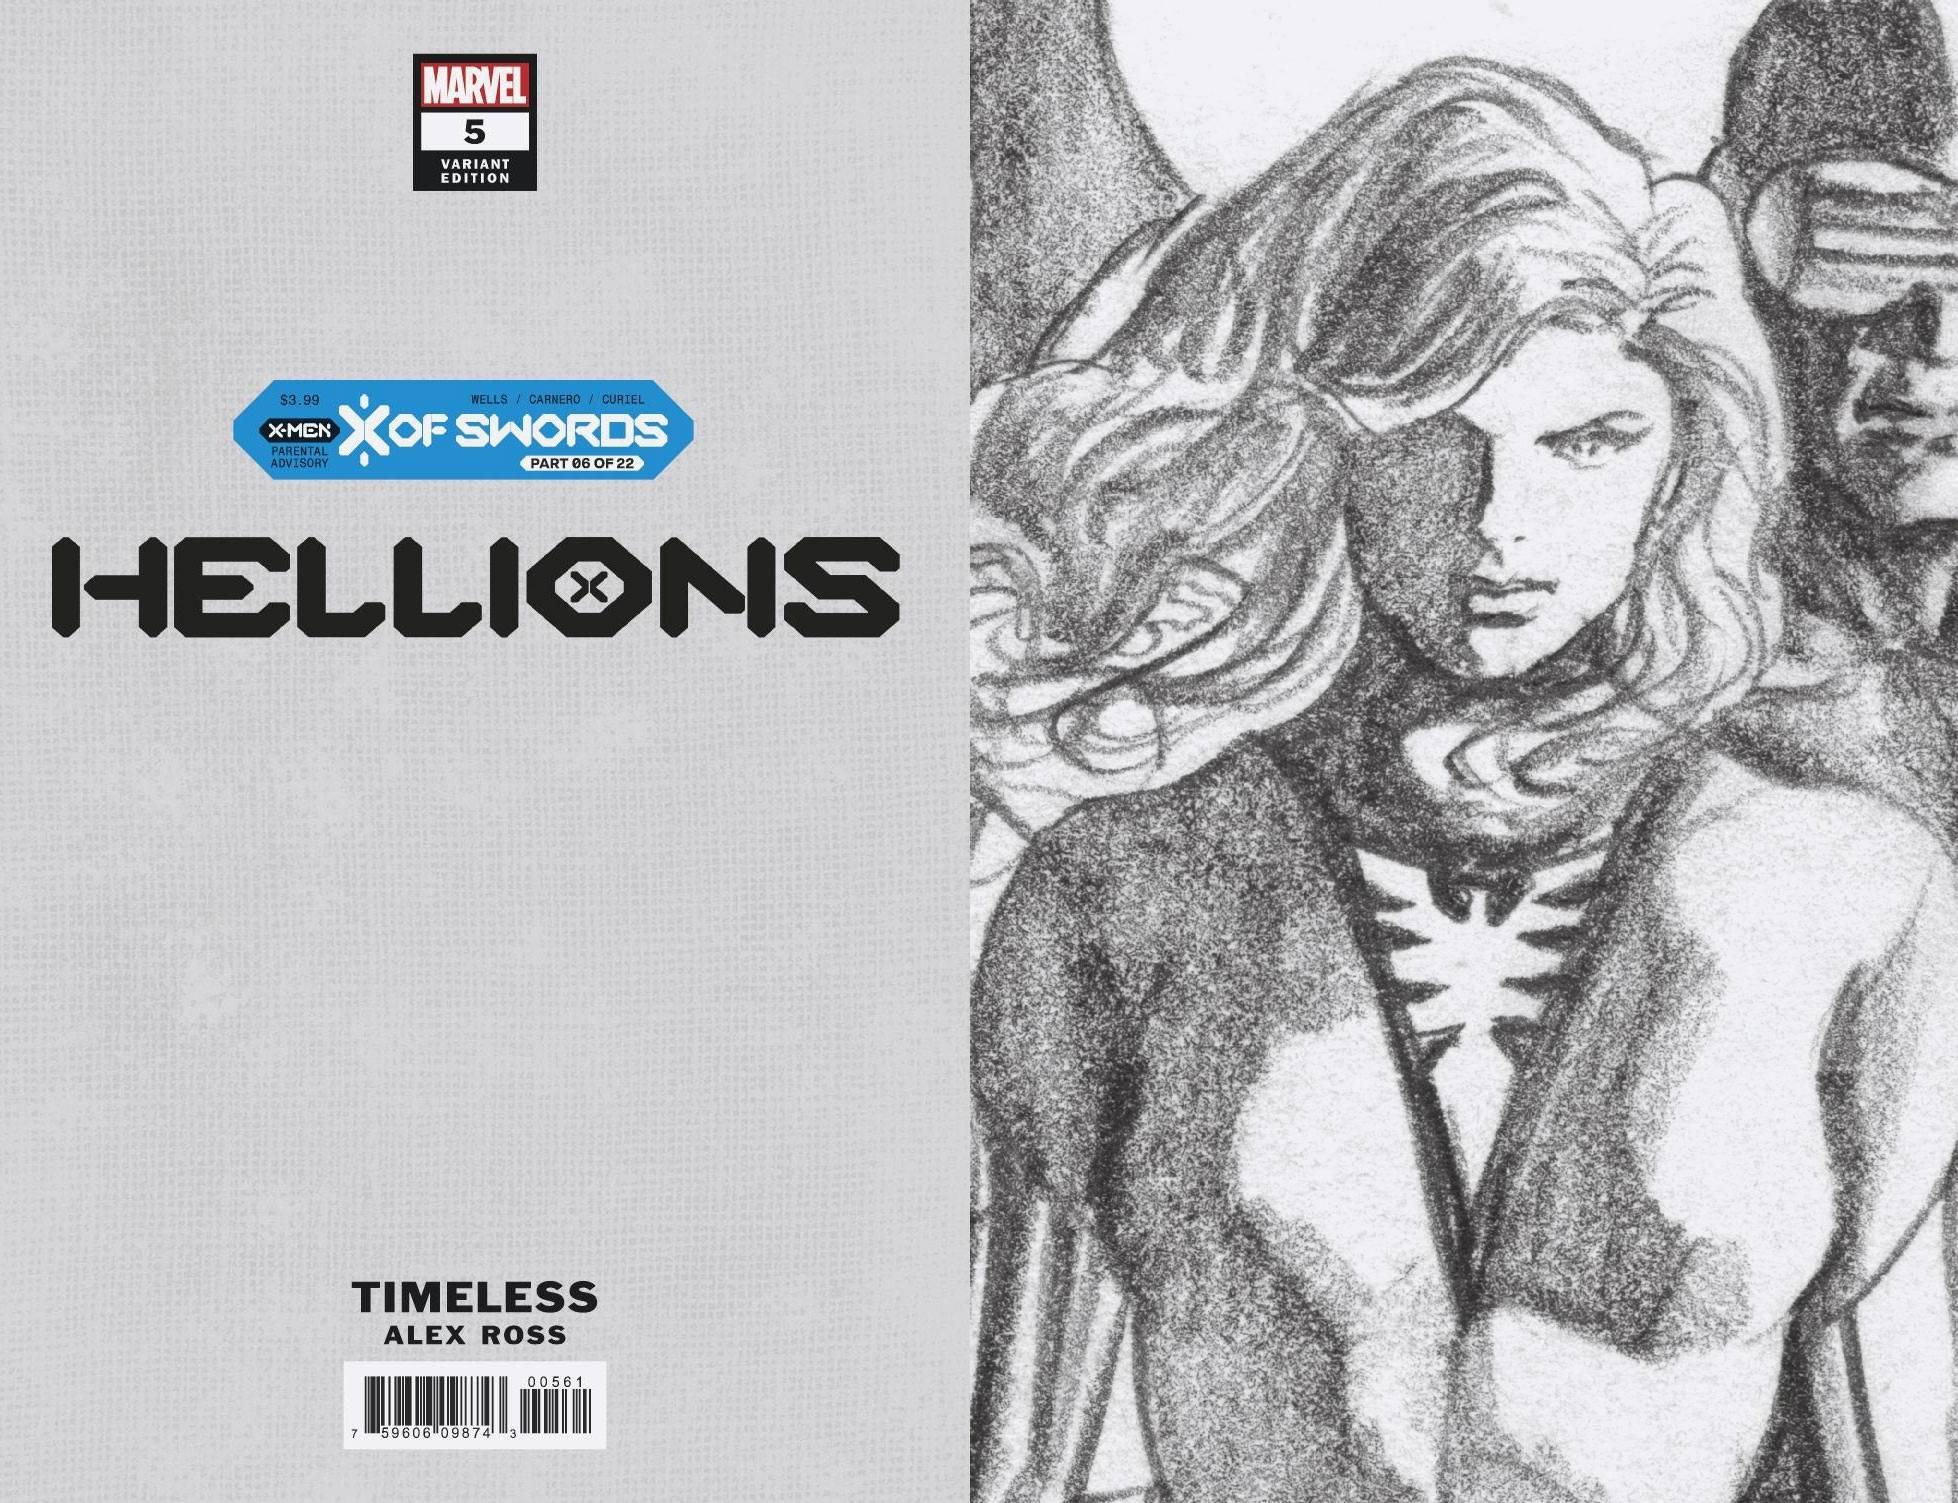 Hellions Vol 1 5 Phoenix Timeless Sketch Wraparound Variant.jpg